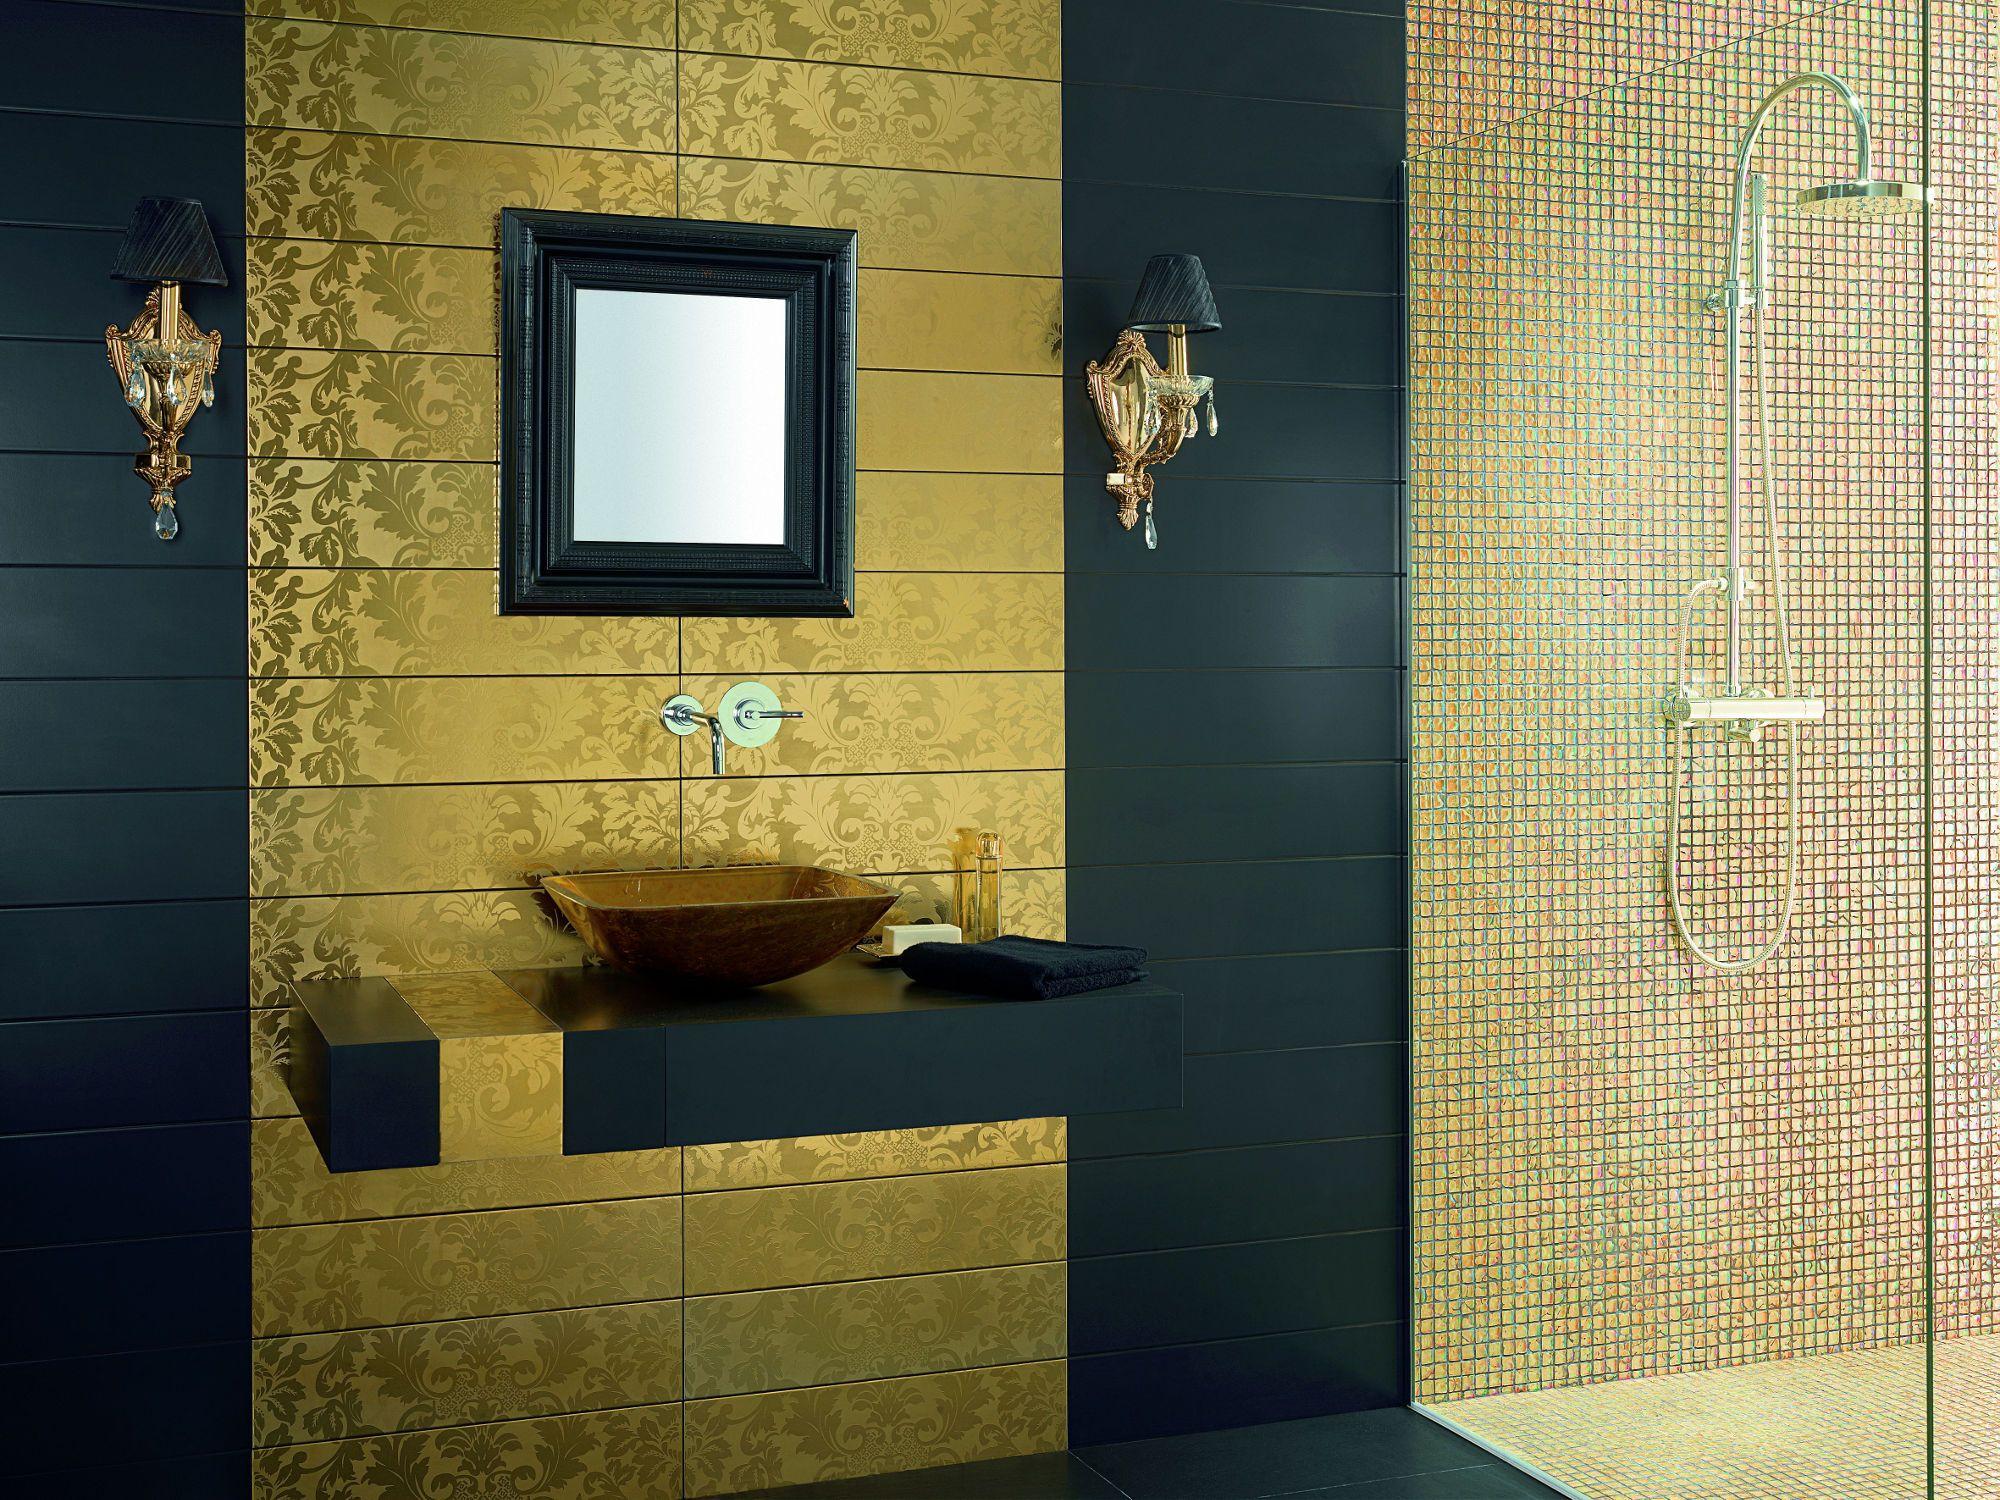 Zlatá koupelna | Domov | Pinterest